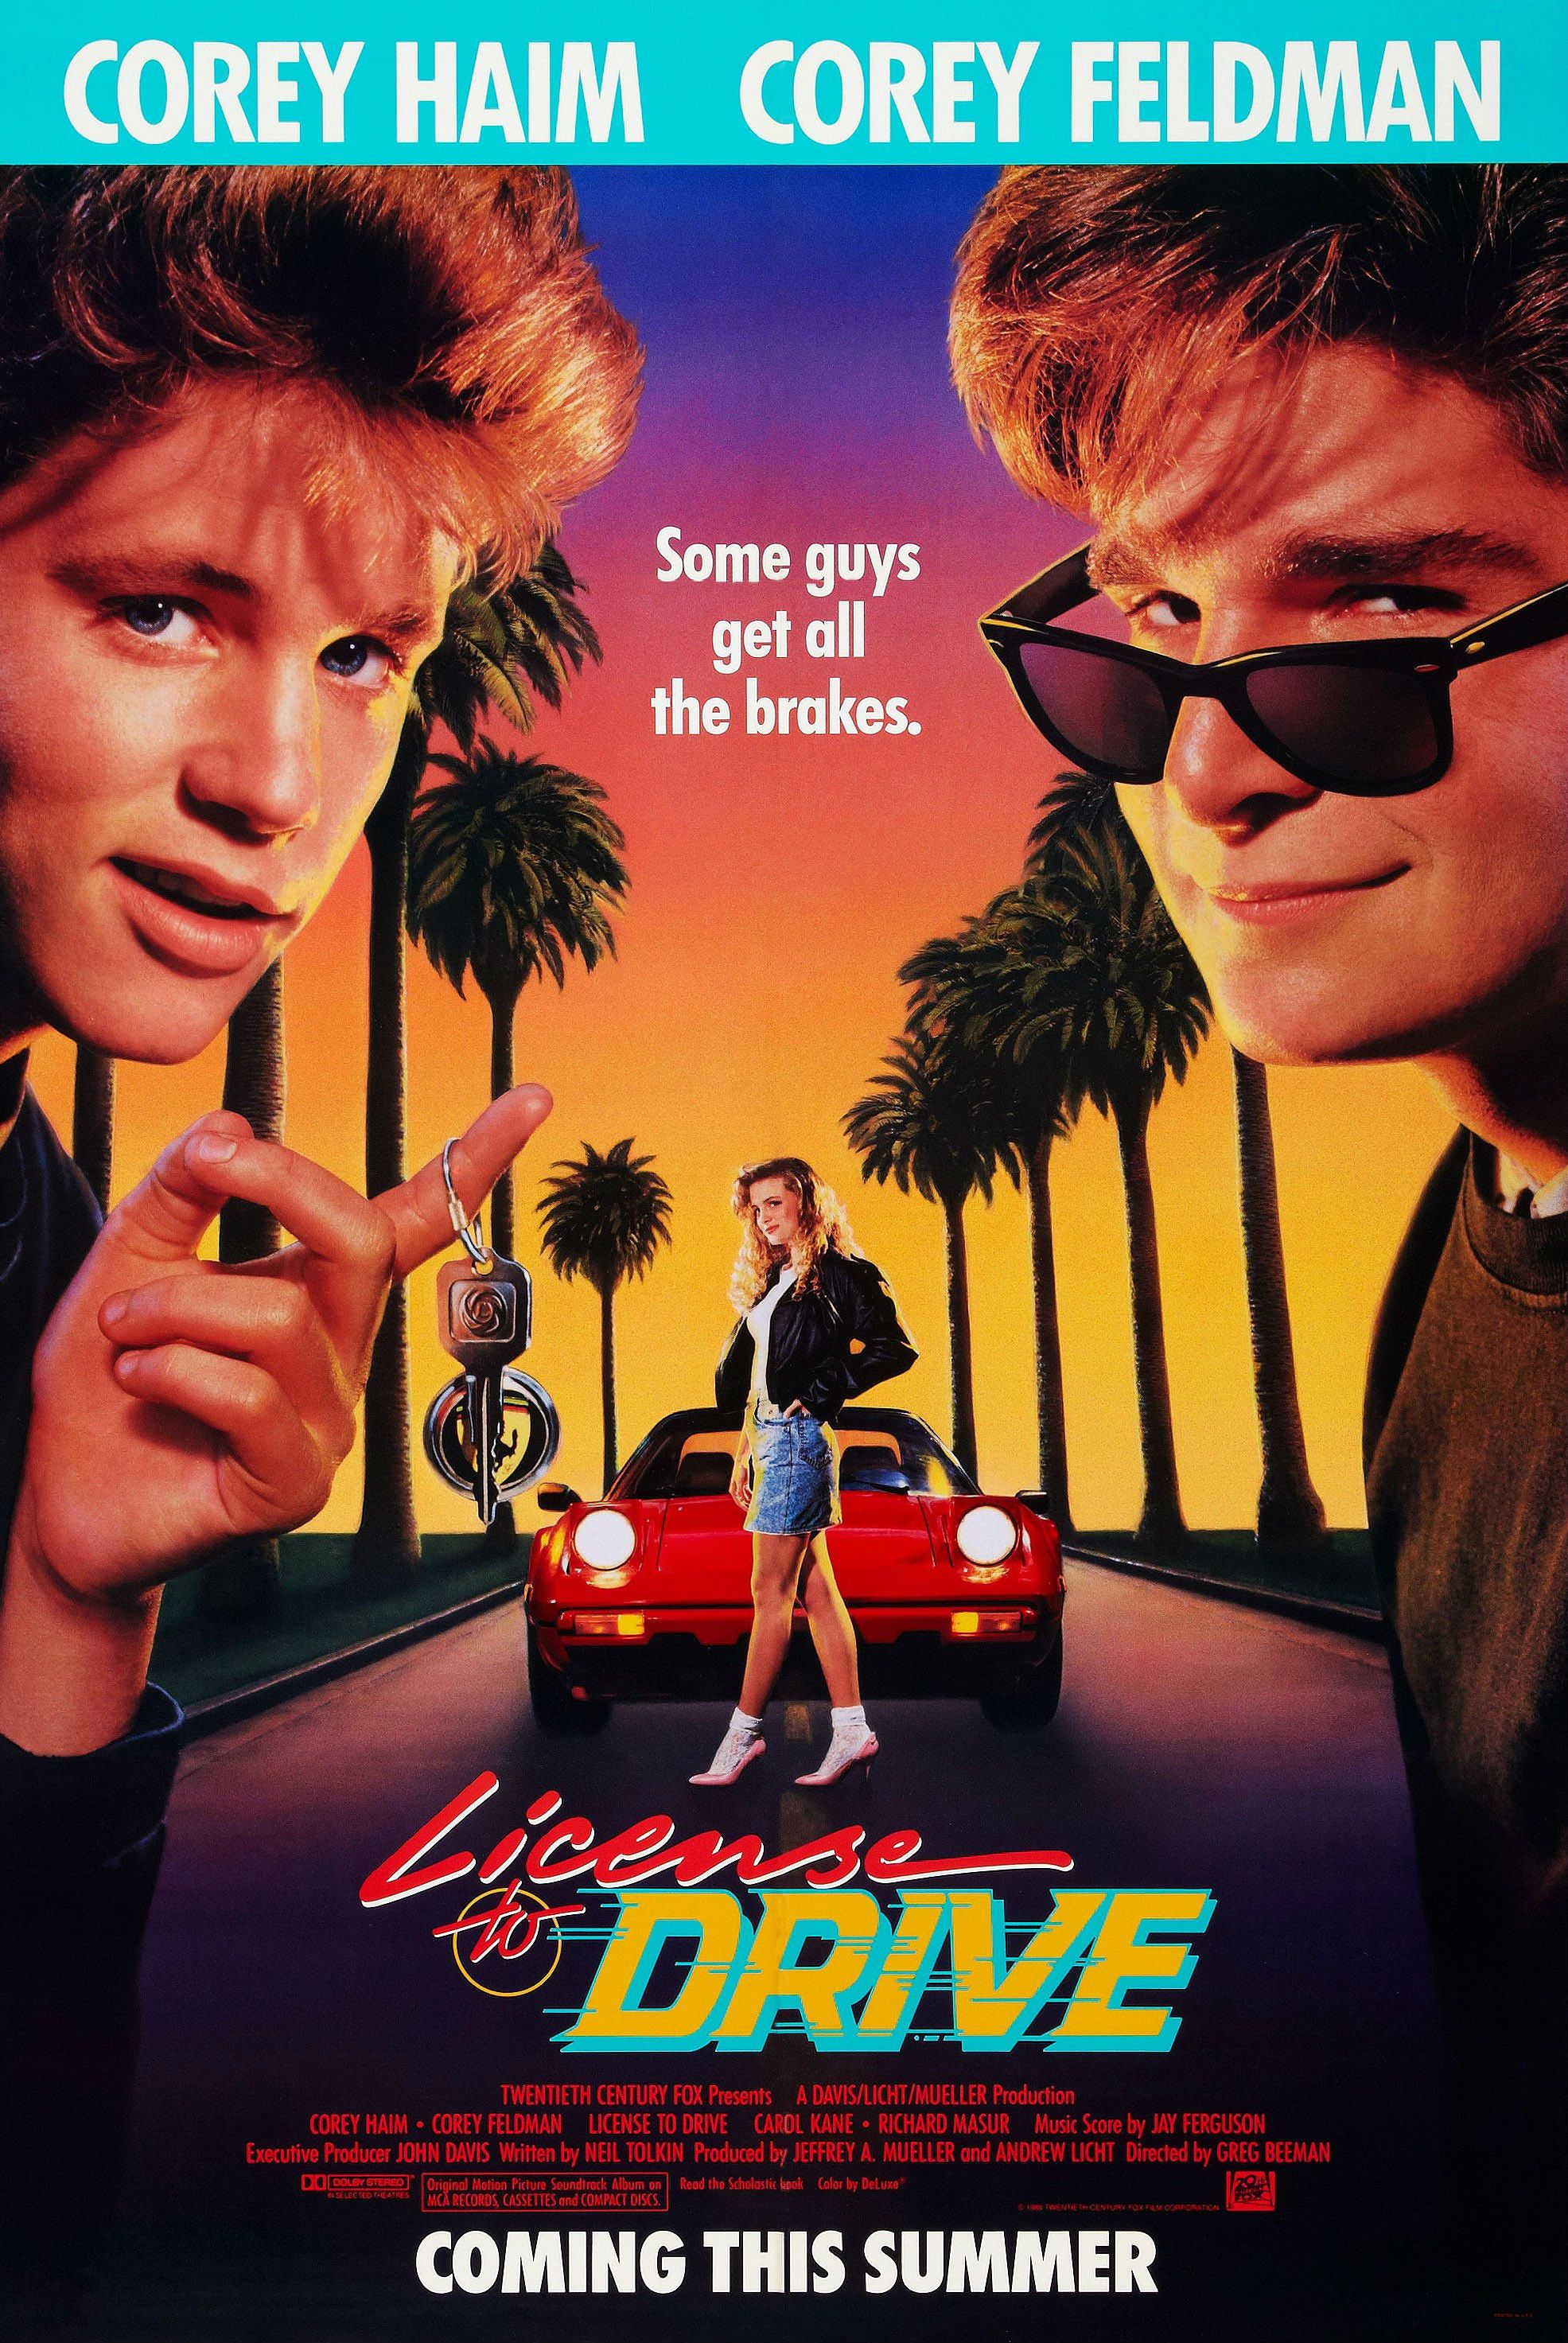 License to drive 1988 corey feldman original movie